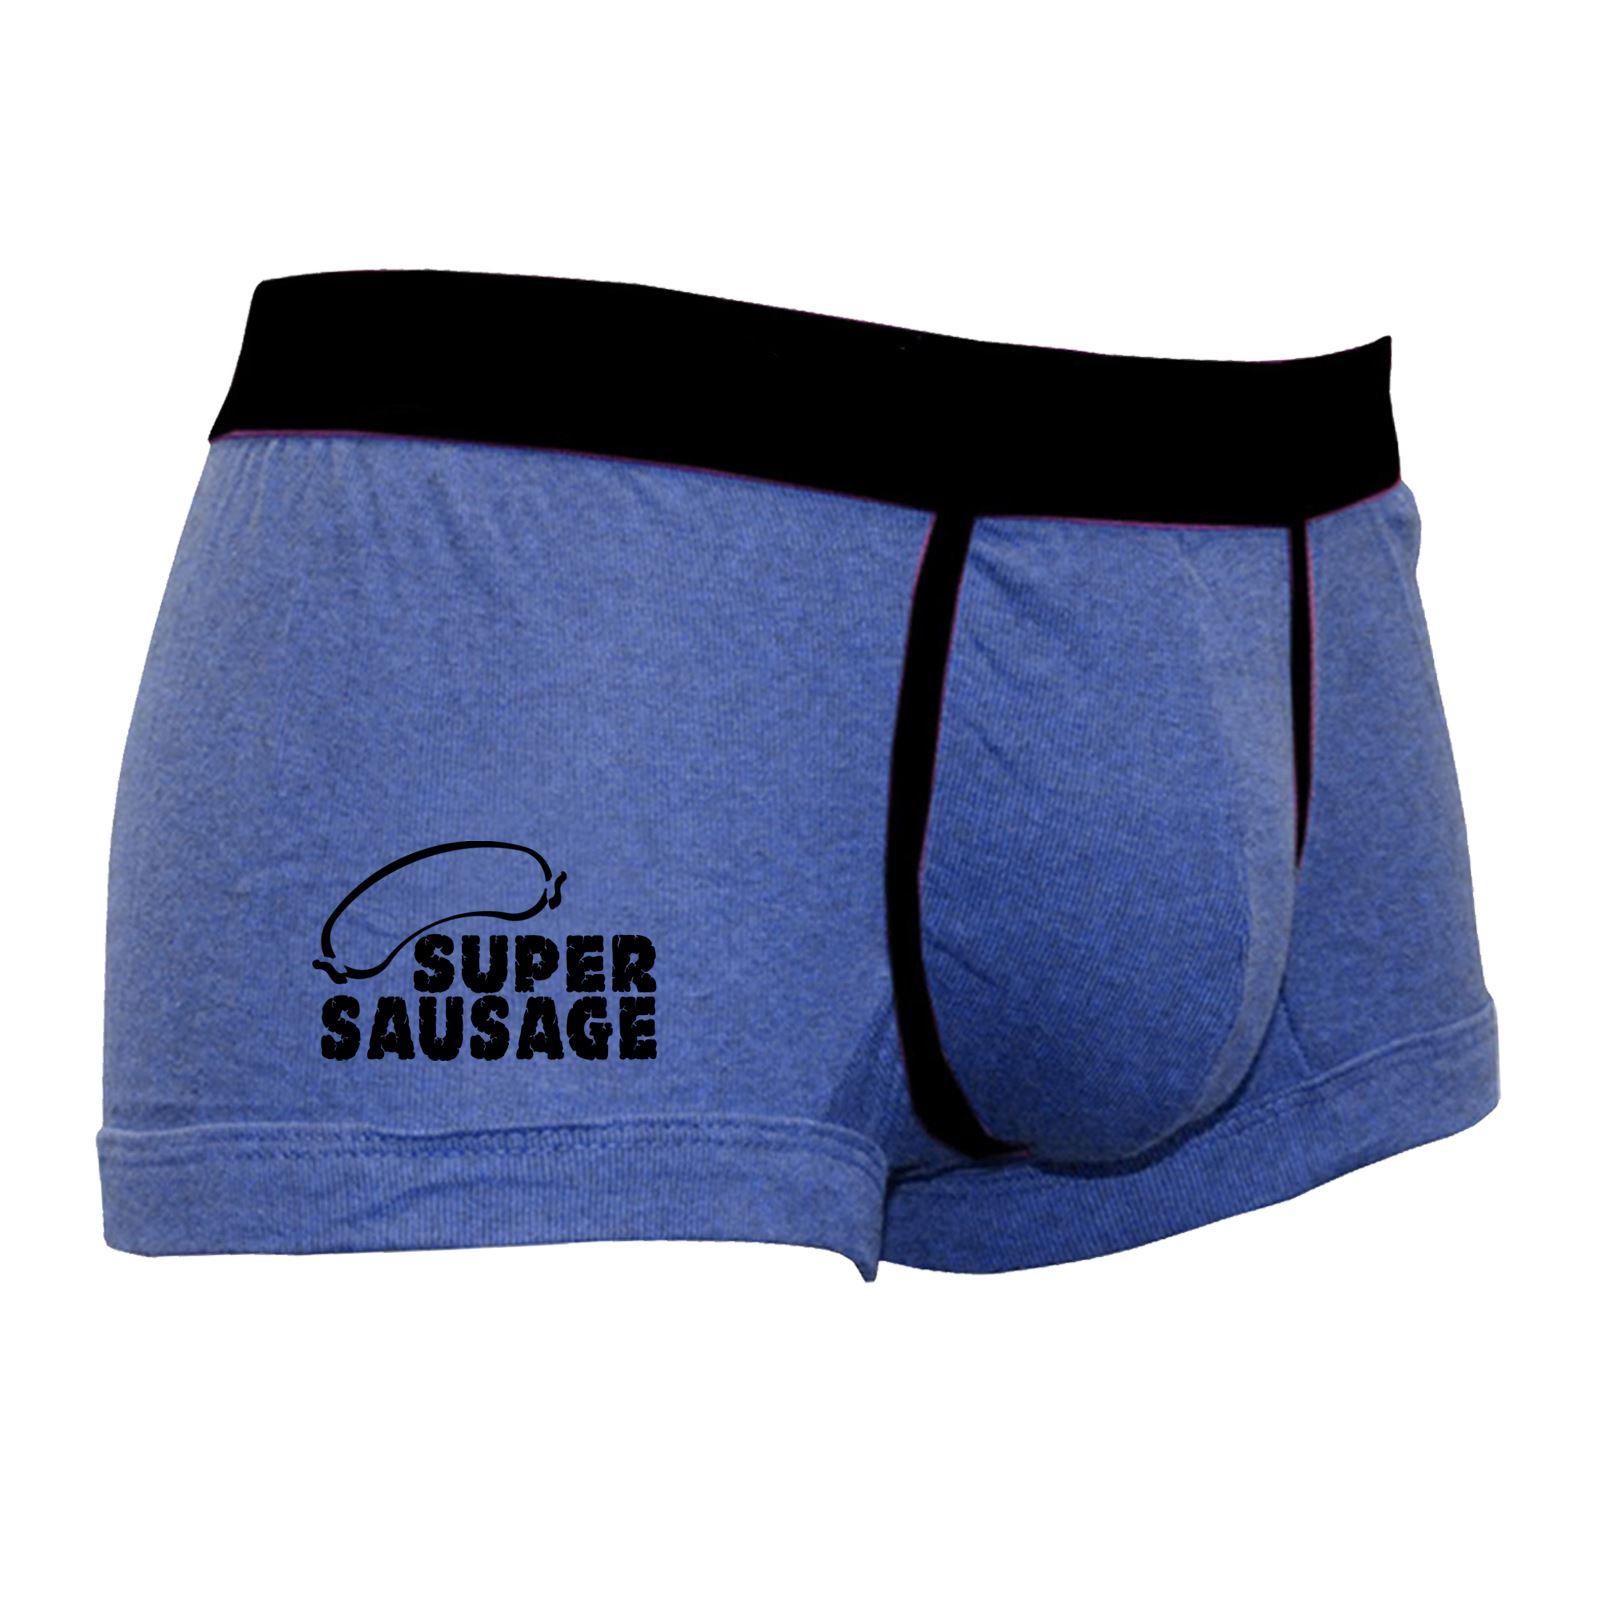 ALM786t-Mens-Funny-Super-Sausage-Boxer-Shorts-Underwear-Boyfriend-Novelty-Gifts